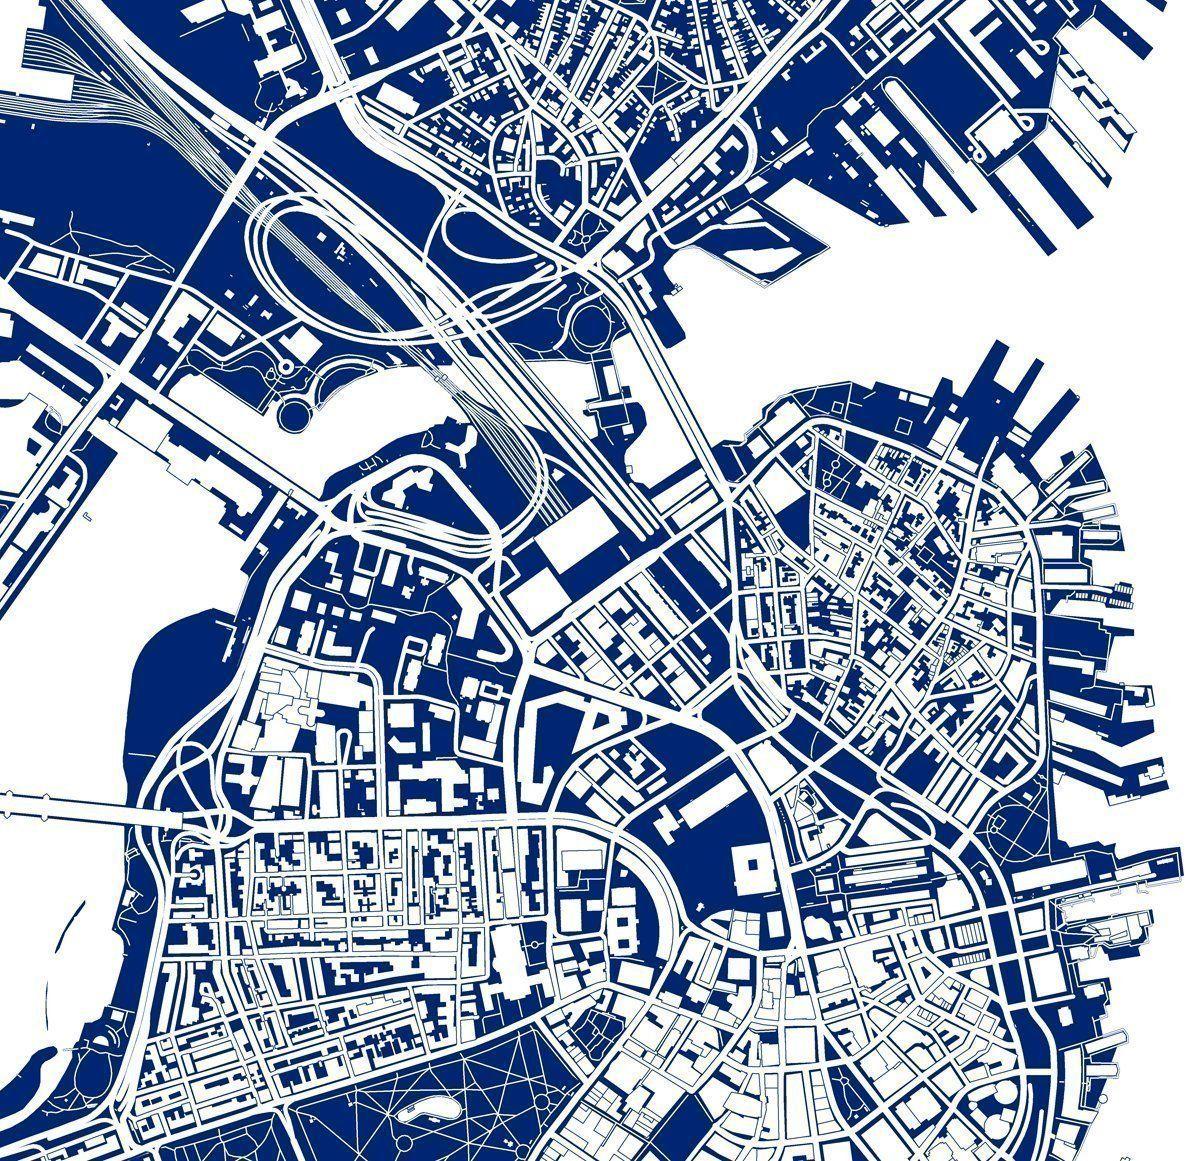 Boston map art print massachusetts navy blue blueprint style city boston map art print massachusetts navy blue blueprint style city artwork malvernweather Gallery